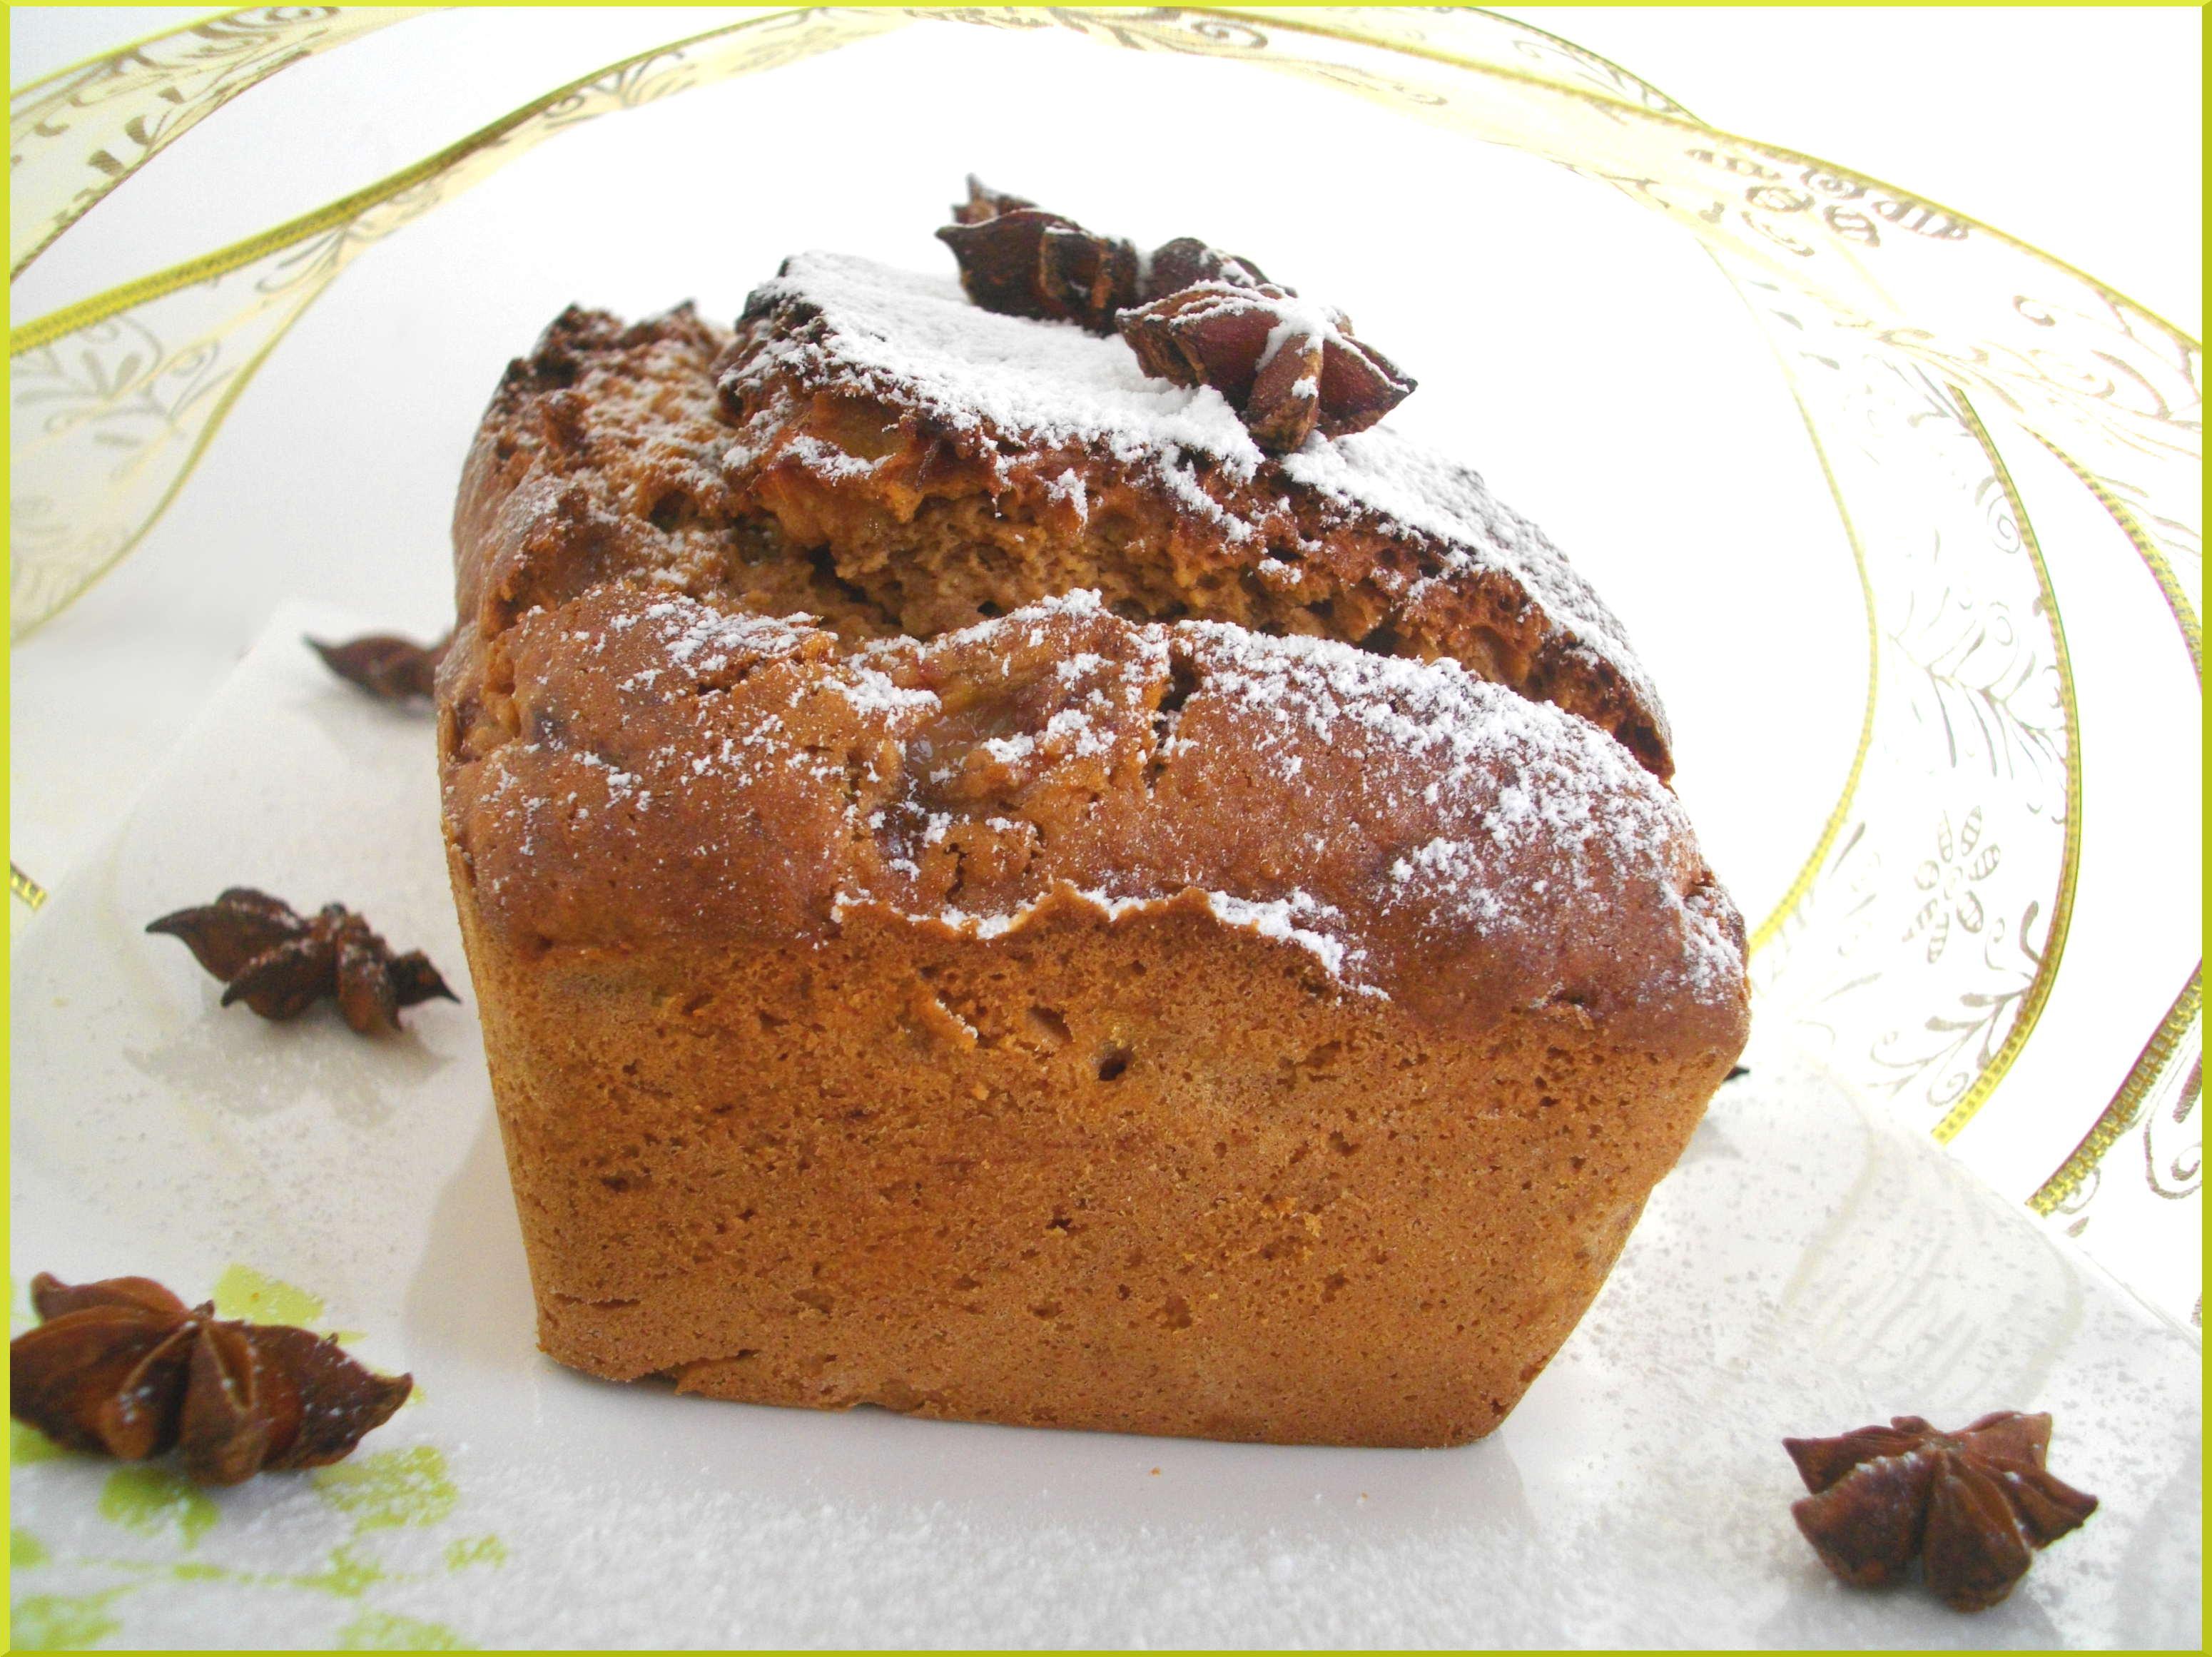 Cake ''Banane, Chocolat, Muscade & Muscovado''